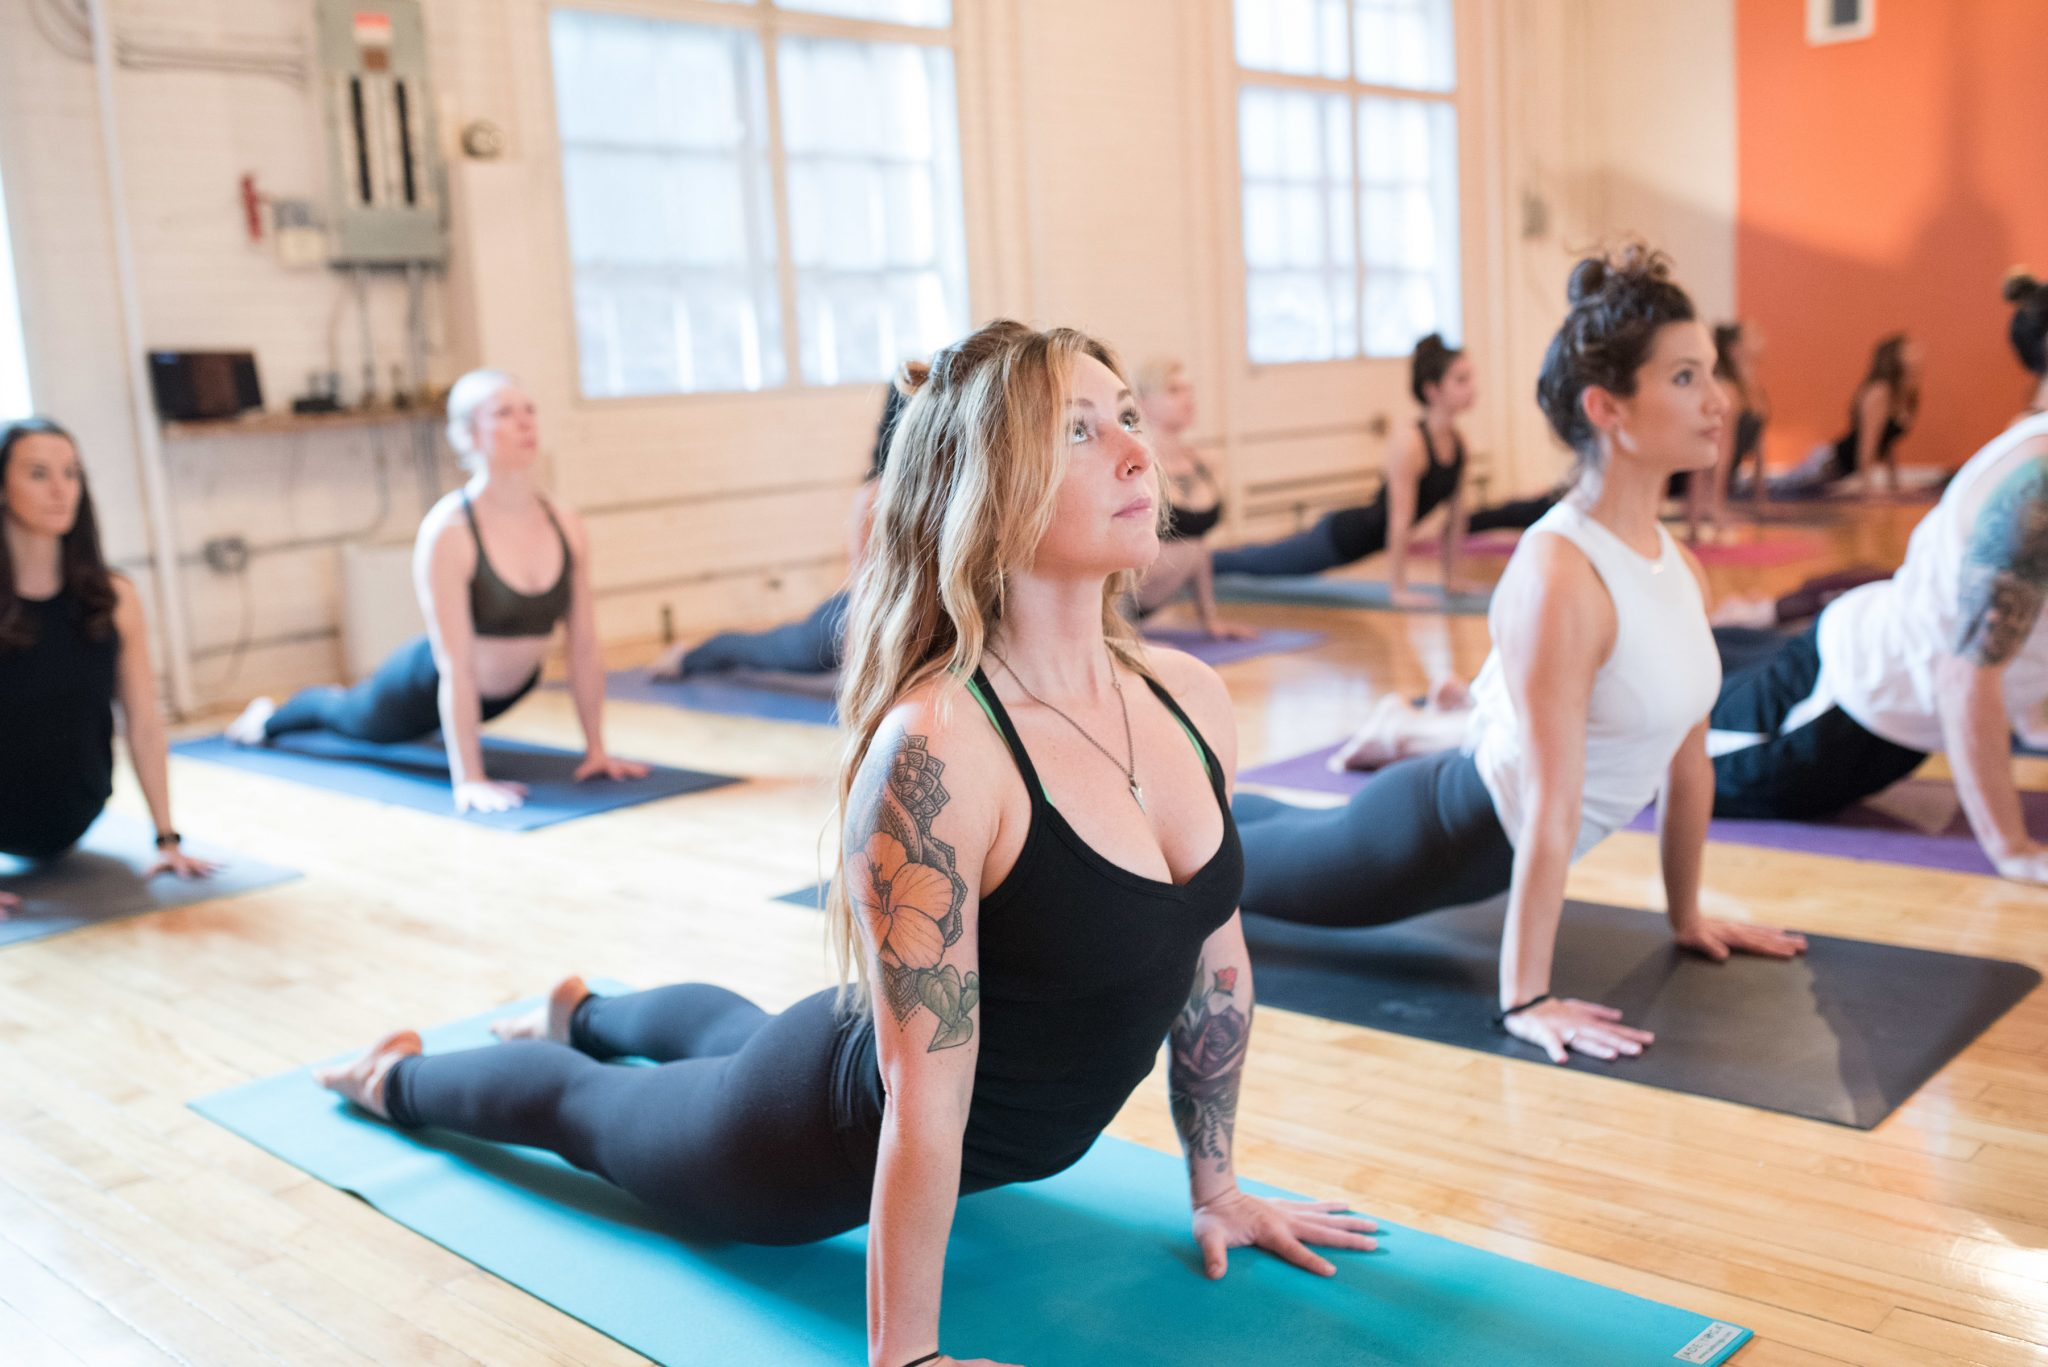 yoga_yoga_geleen_heerlen_sittard_Triggerz_help_groep_training_fitness_health_club_landgraaf_landgraaf_google_heerlen_geleen_sporten